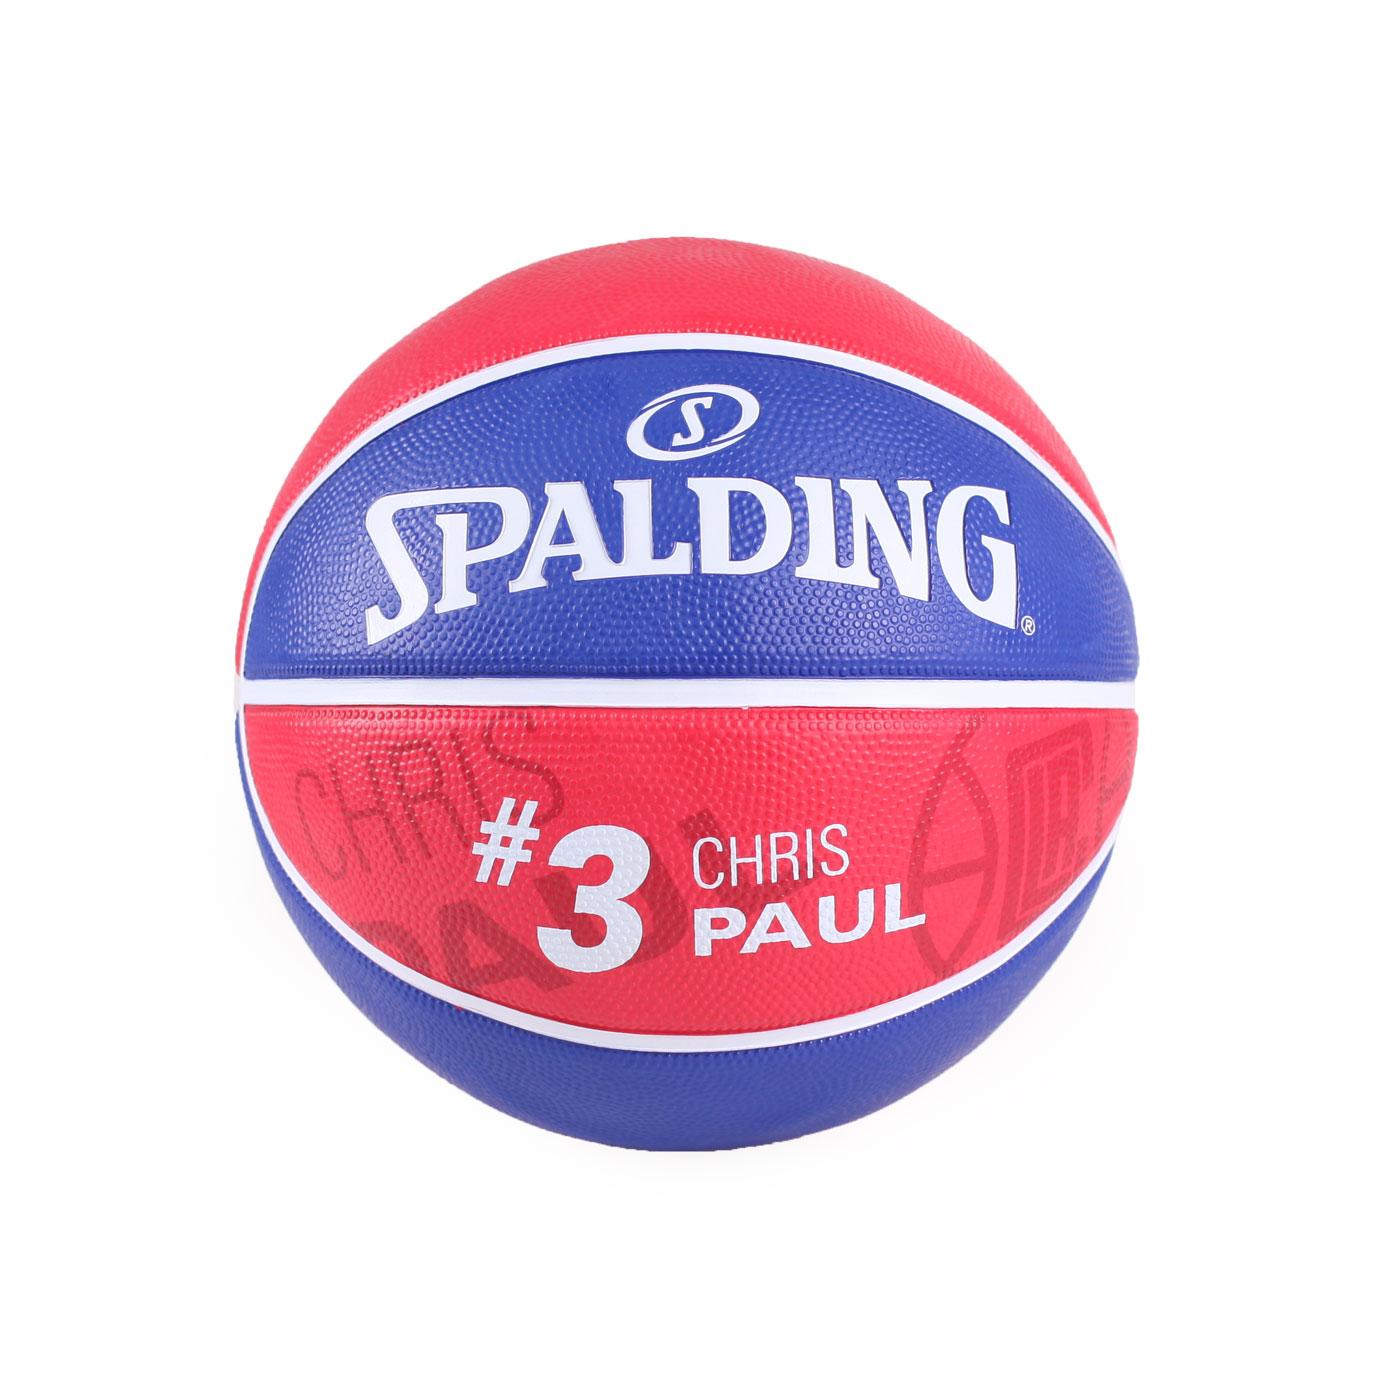 SPALDING 快艇-保羅 Chris Paul #7 籃球(斯伯丁 7號球 NBA 【99301452】≡排汗專家≡